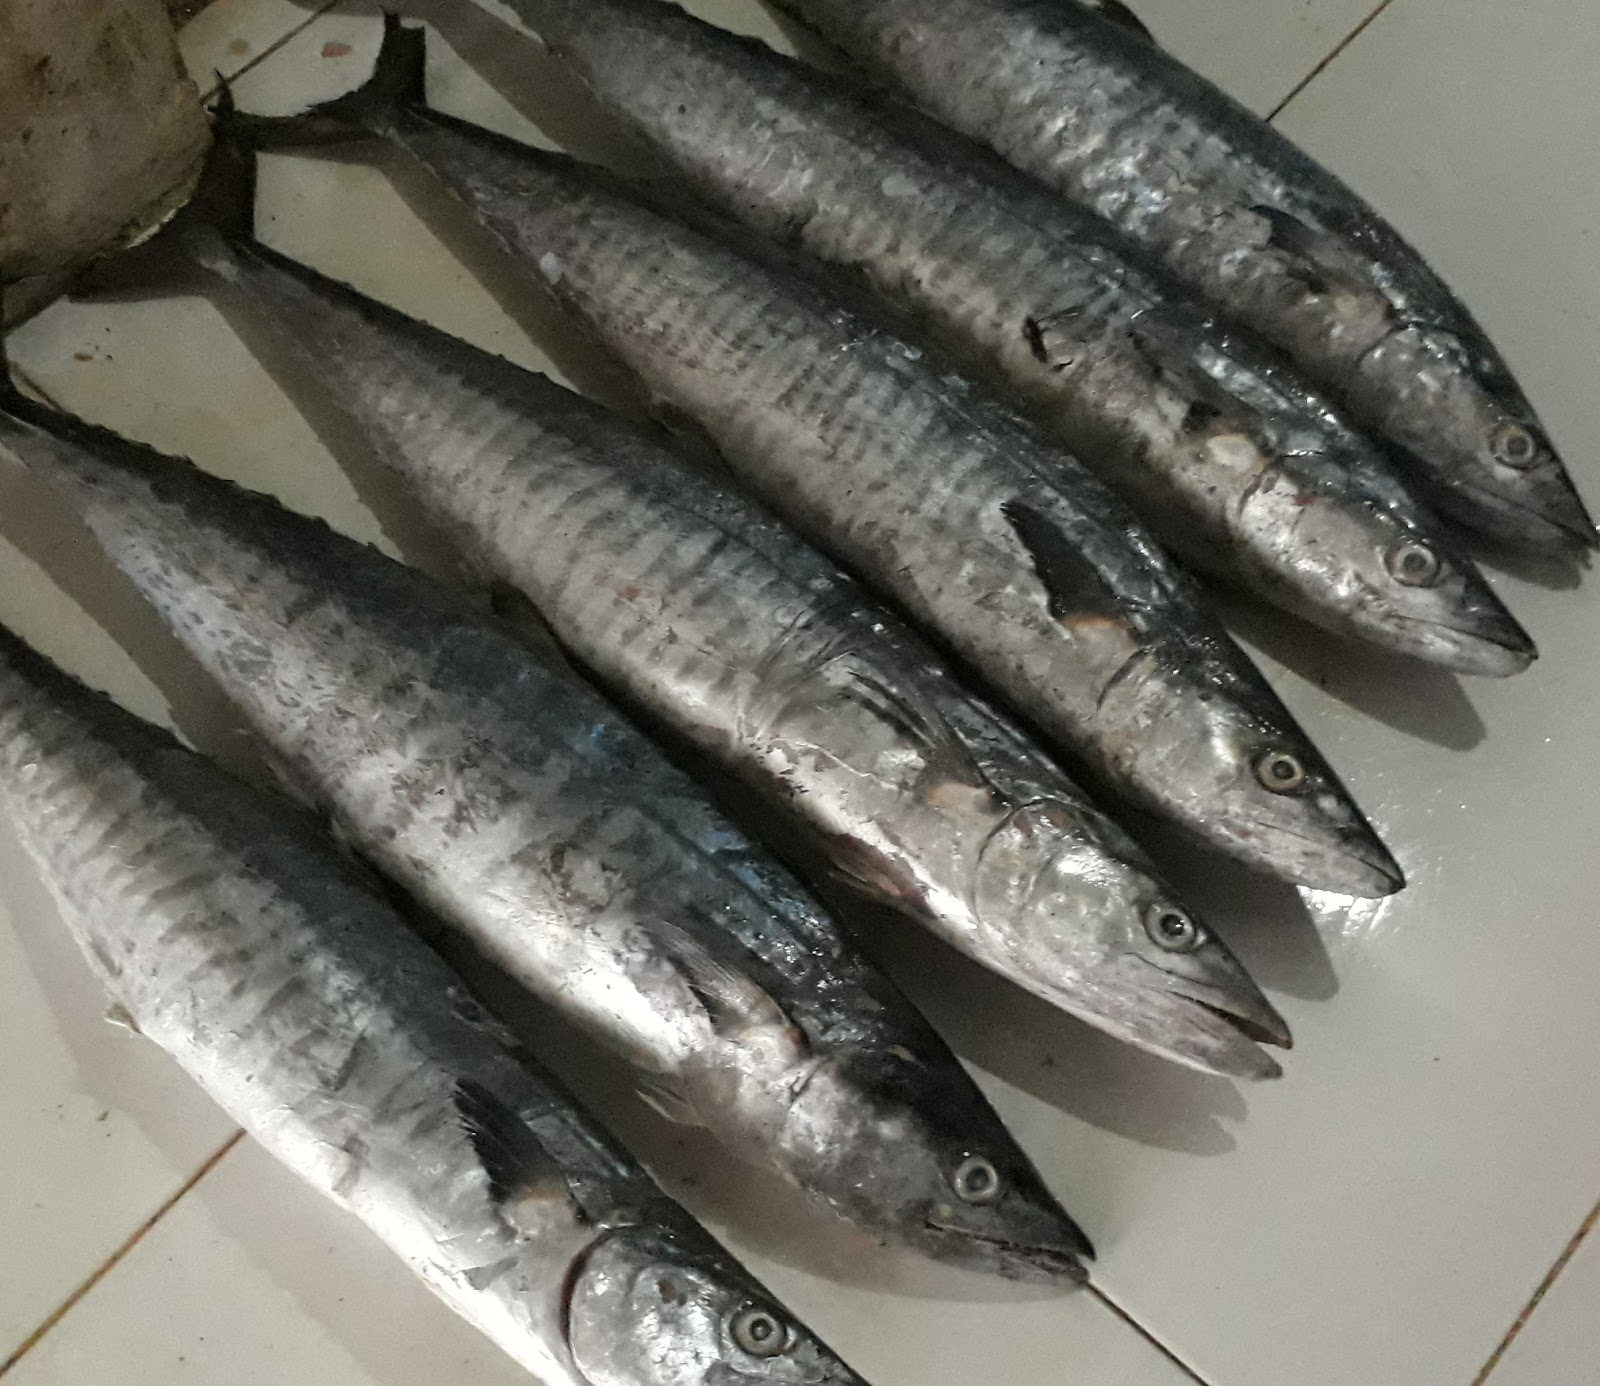 Unduh 95+ Gambar Olahan Ikan Tenggiri HD Terpopuler